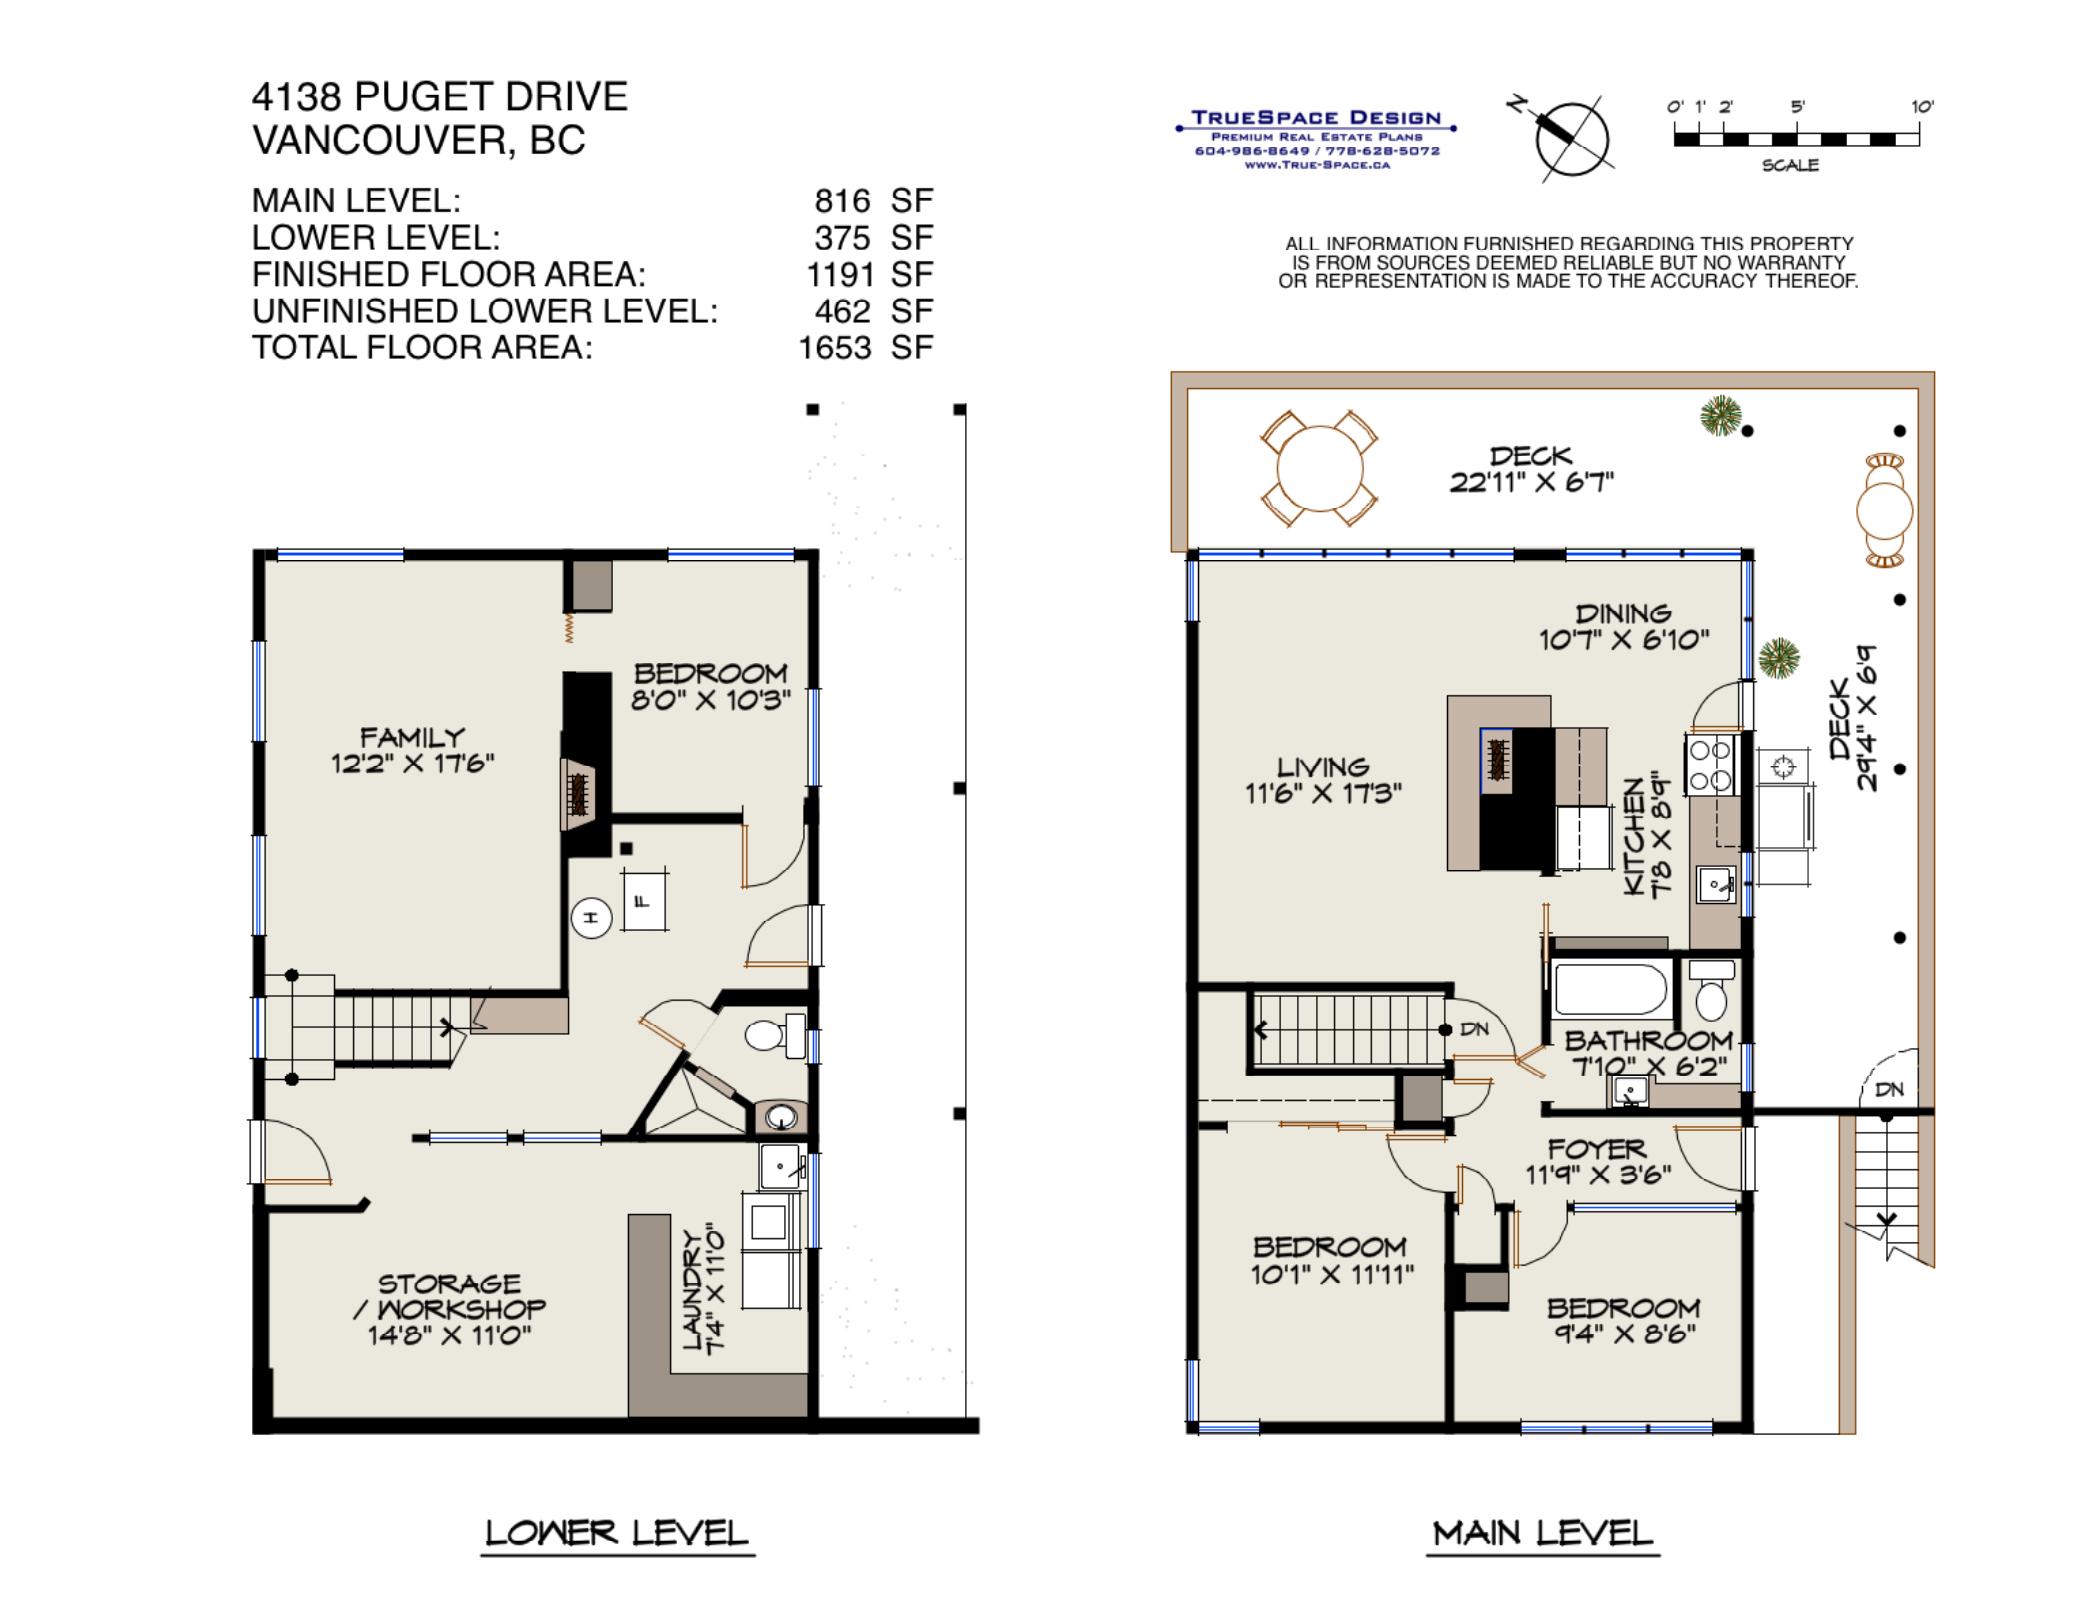 Kate Miller's 4138 Puget Drive Floor Plan